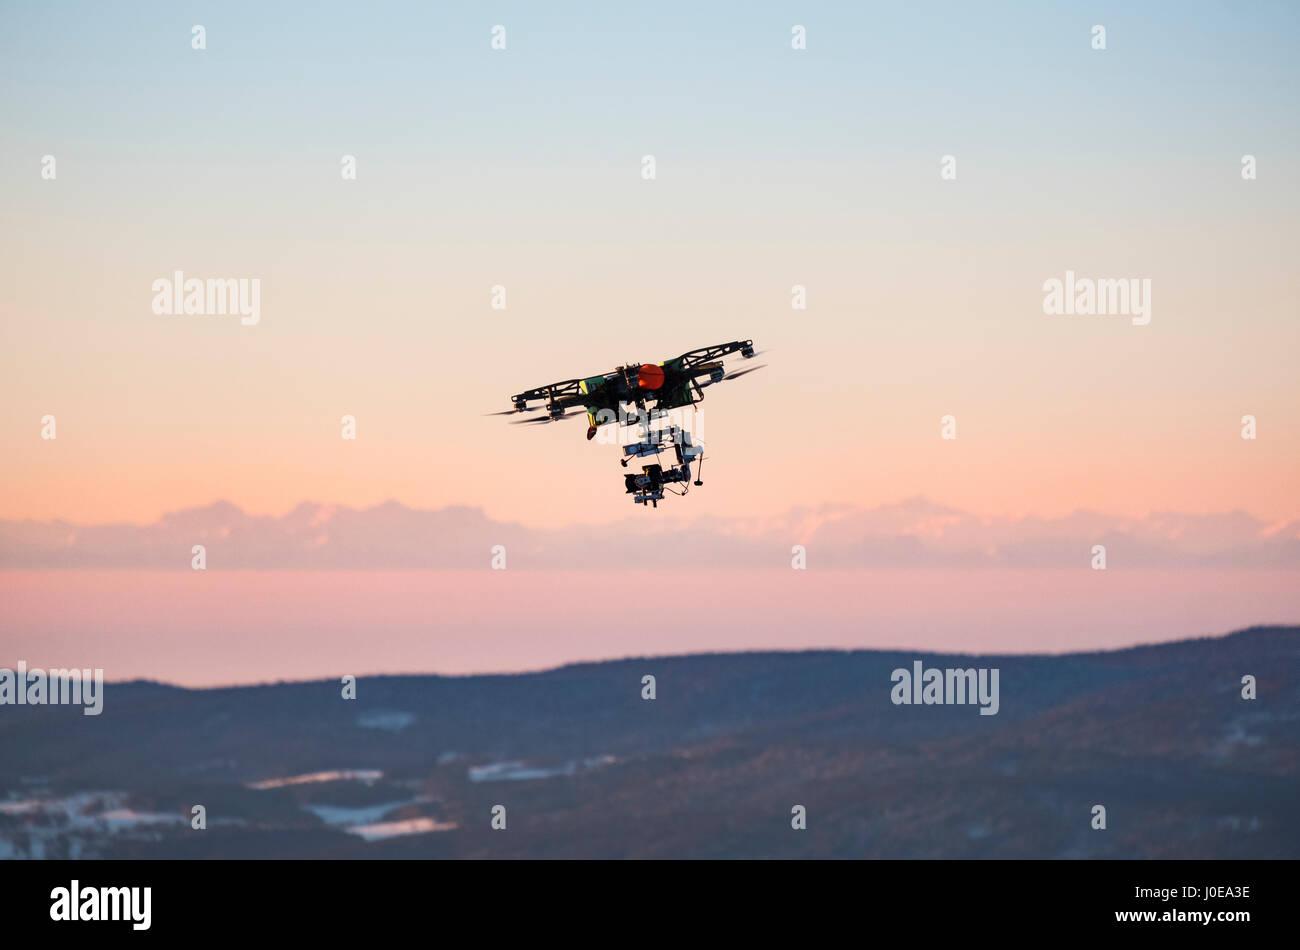 Flying drone, Großer Arber, Bavarian Forest, Lower Bavaria, Bavaria, Germany - Stock Image